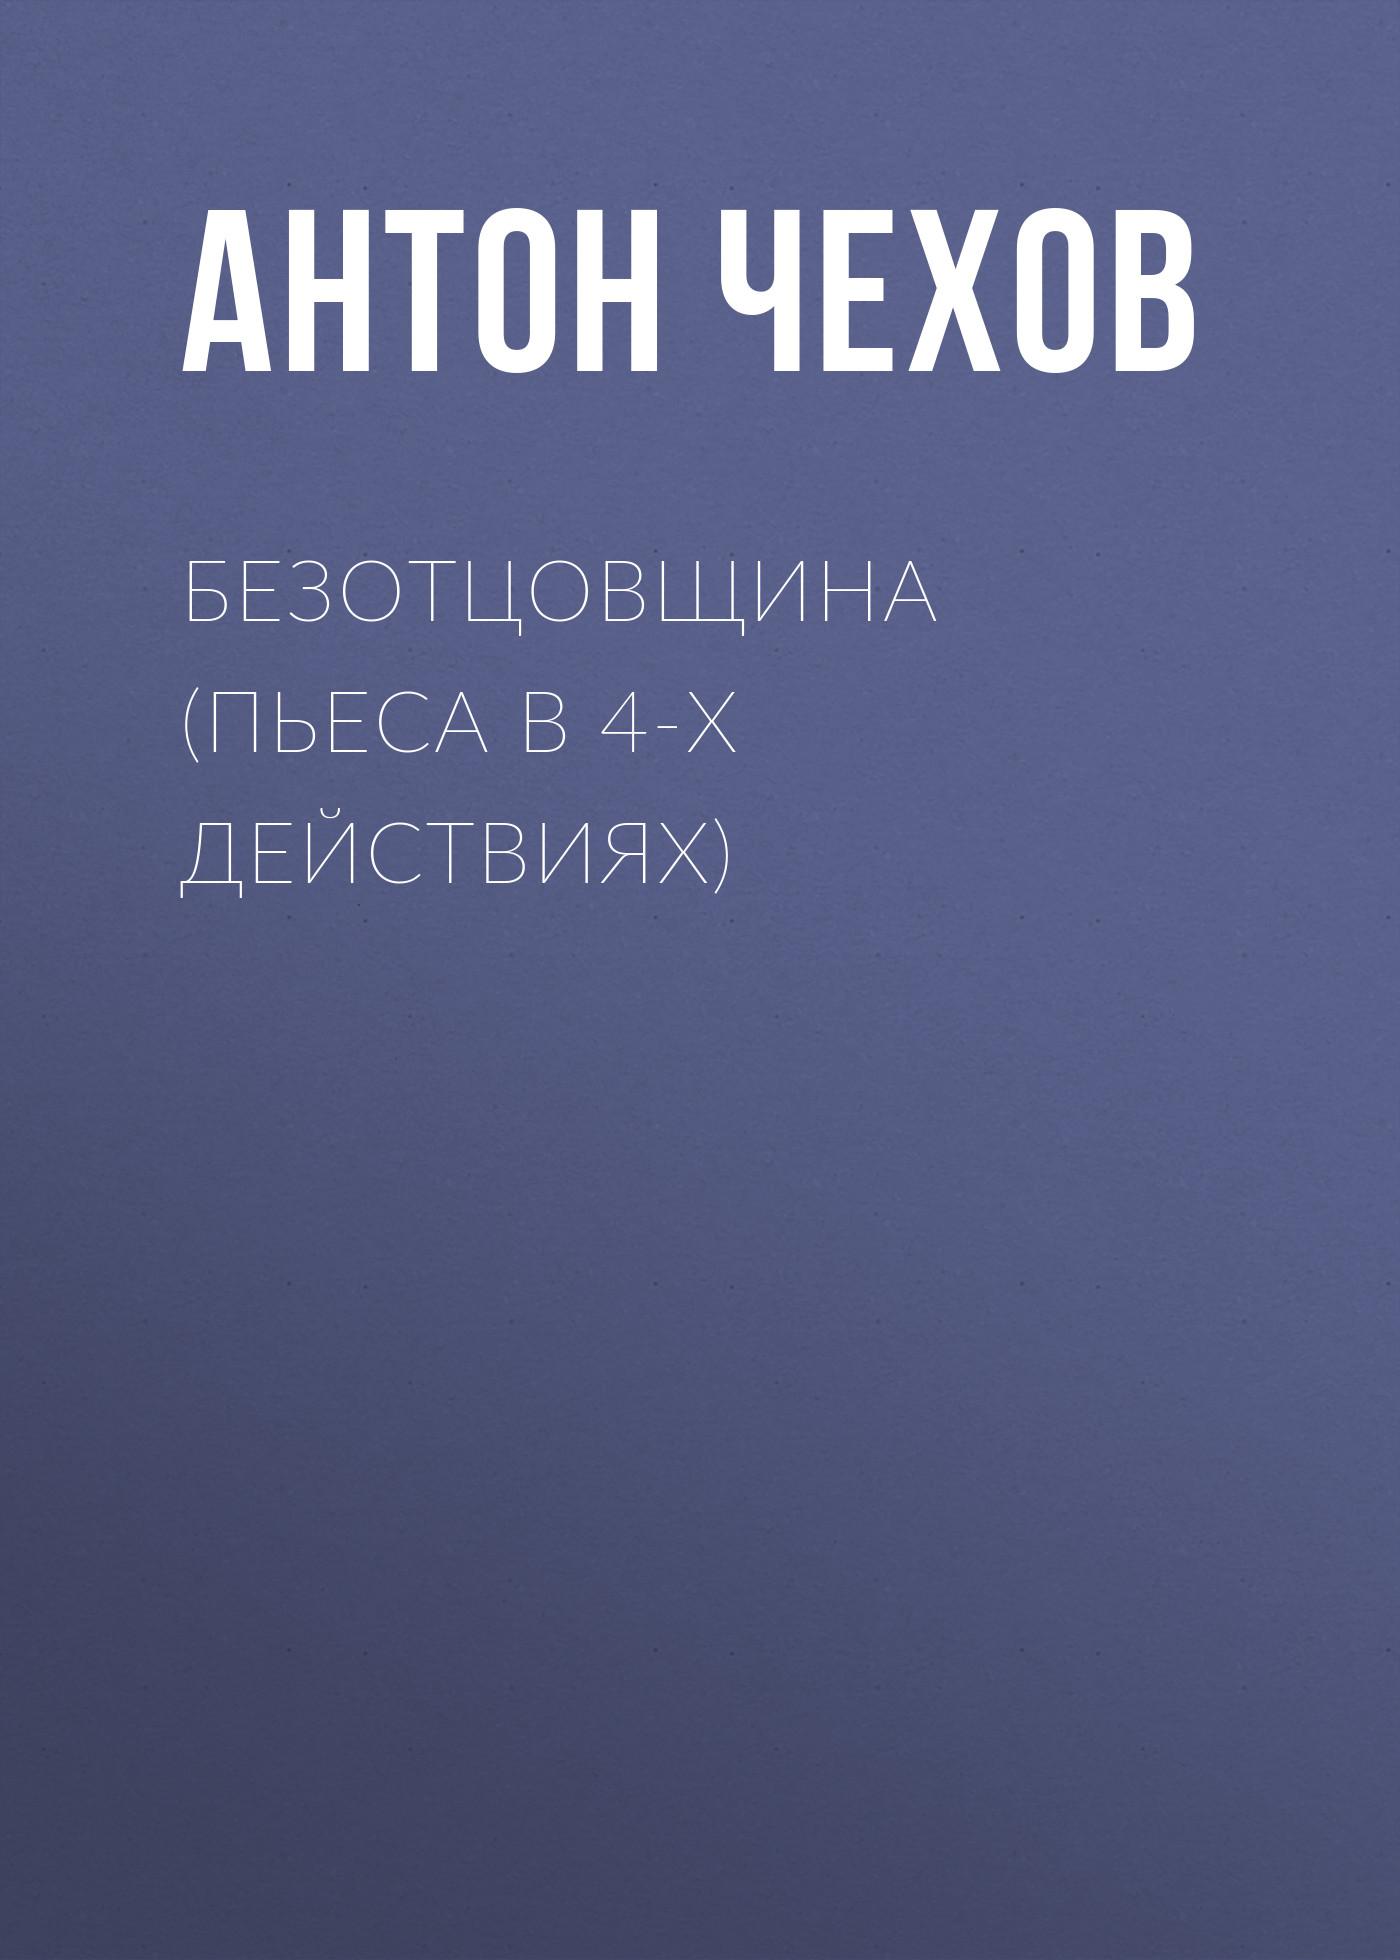 Антон Чехов Безотцовщина (пьеса в 4-х действиях) цена